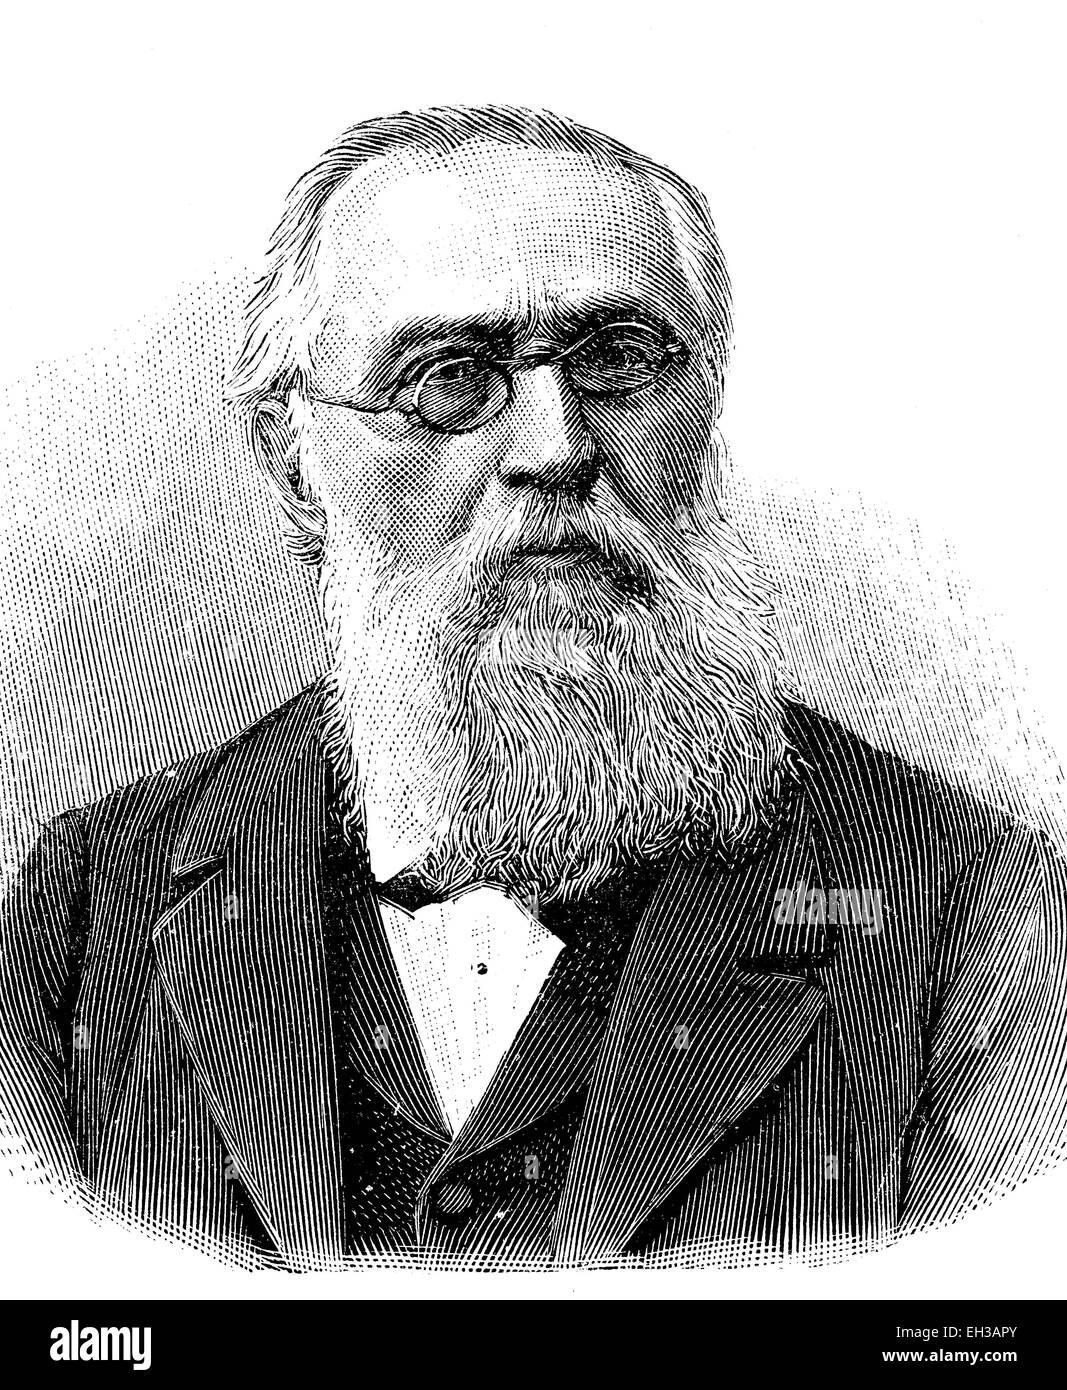 Carl Philipp Euler, 1828 - 1901, German gymnastics teacher and writer, wood engraving - carl-philipp-euler-1828-1901-german-gymnastics-teacher-and-writer-EH3APY